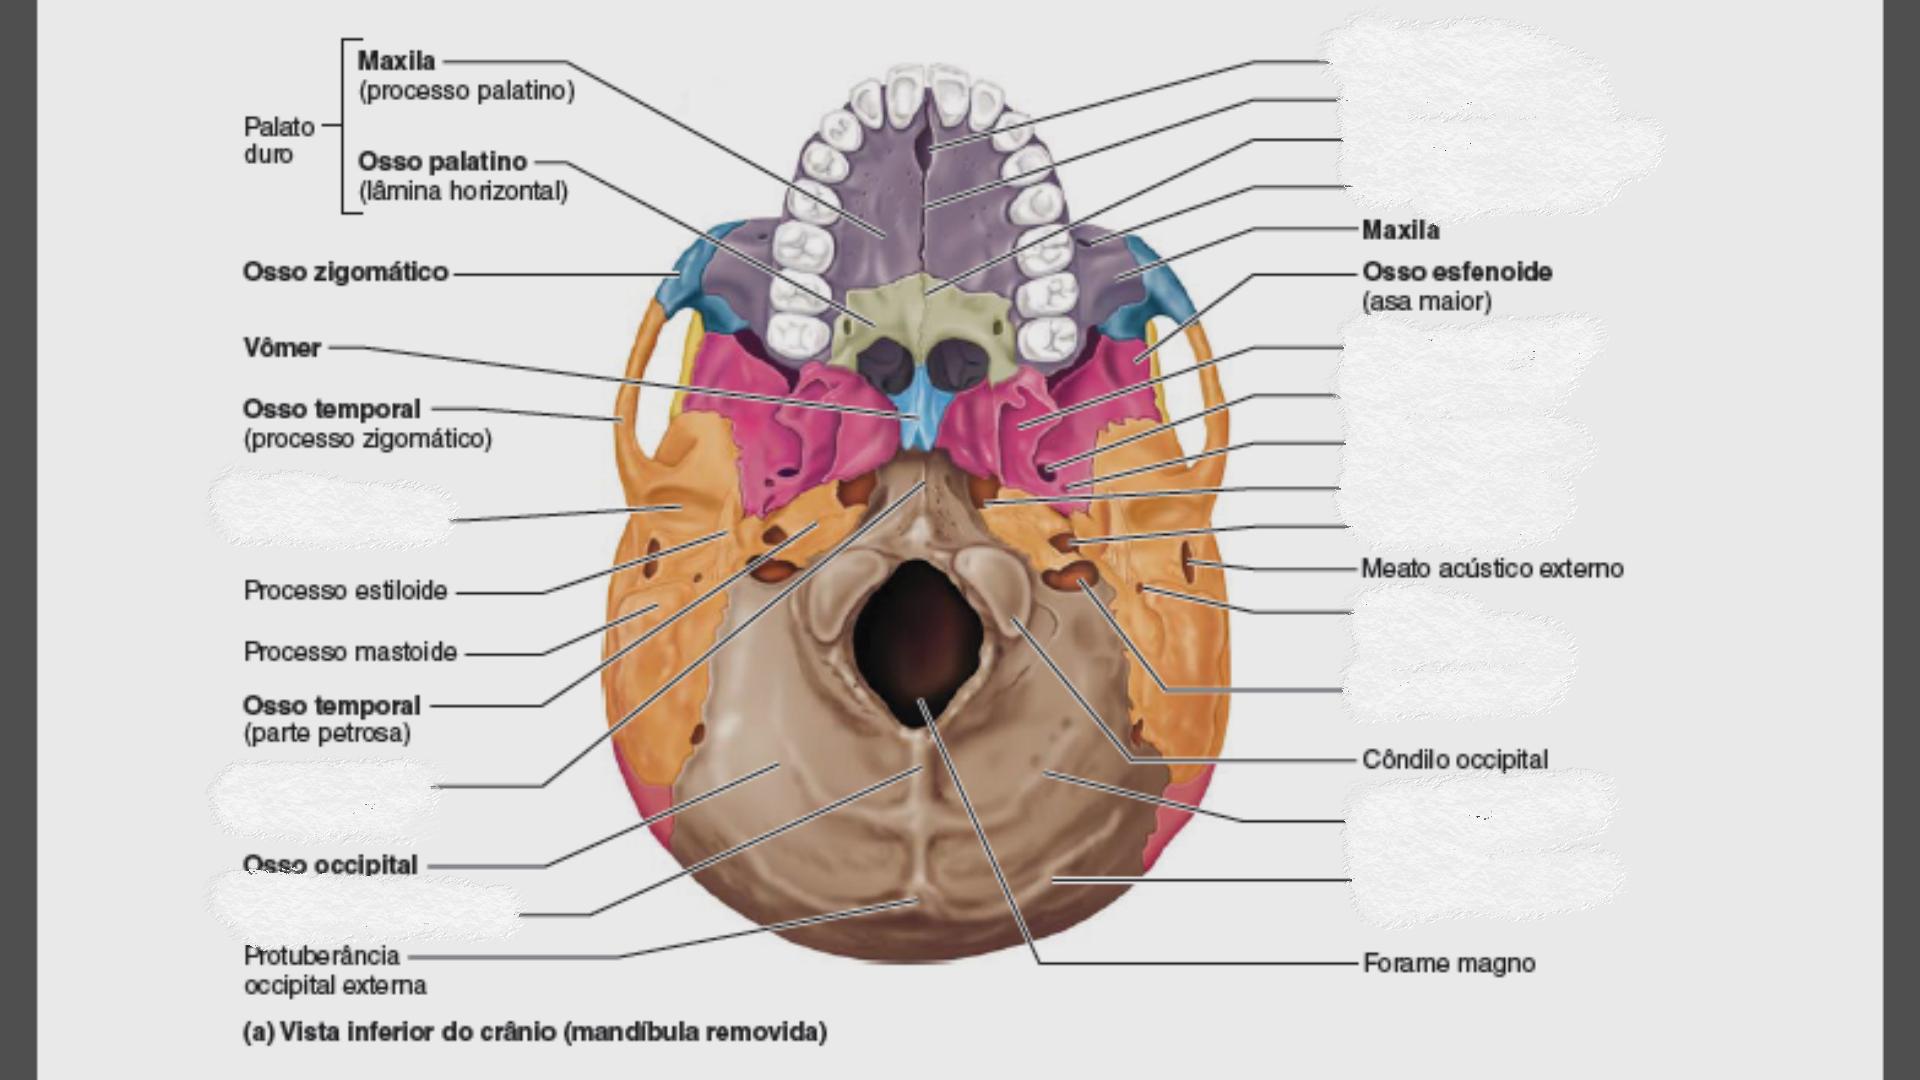 Pin by Ludovina Rebelo on anatomia 8 | Pinterest